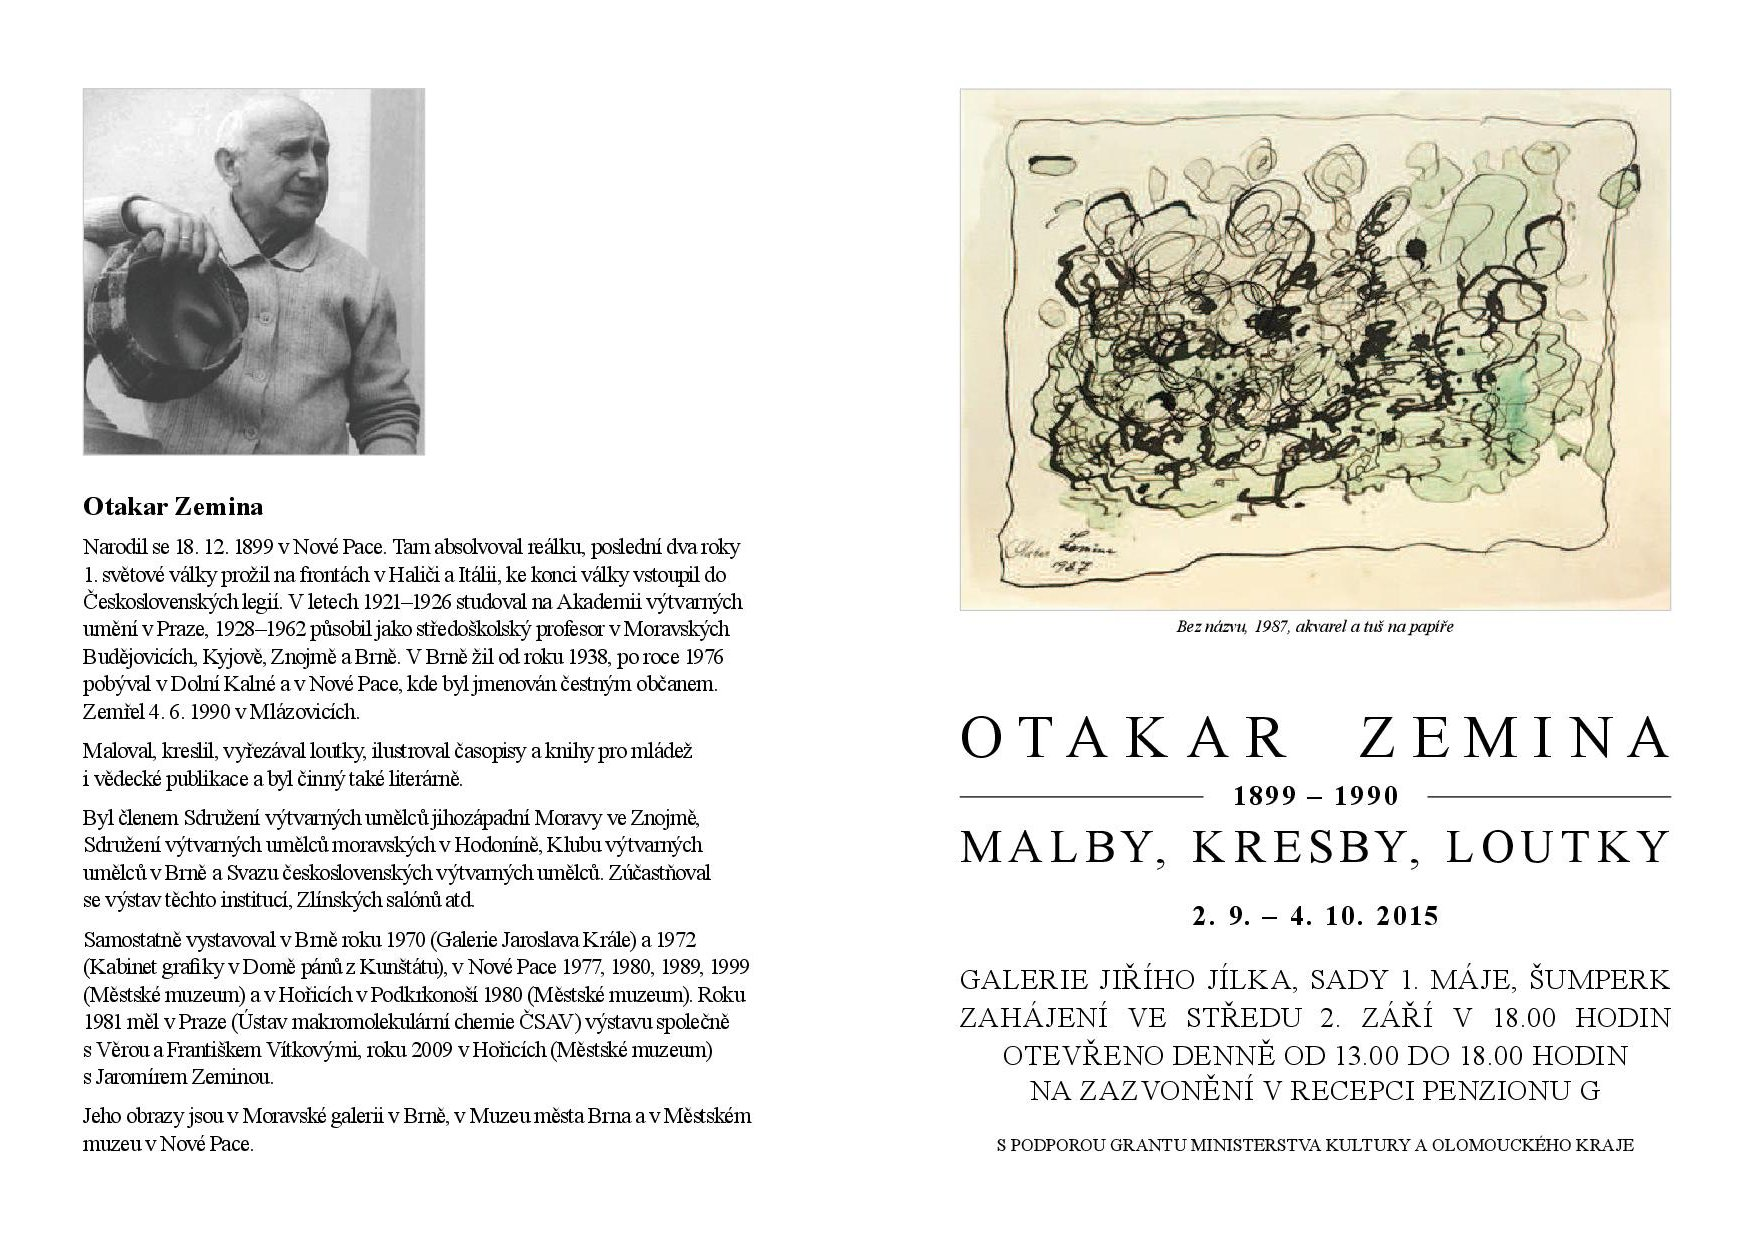 Otakar Zemina list mejl pdf